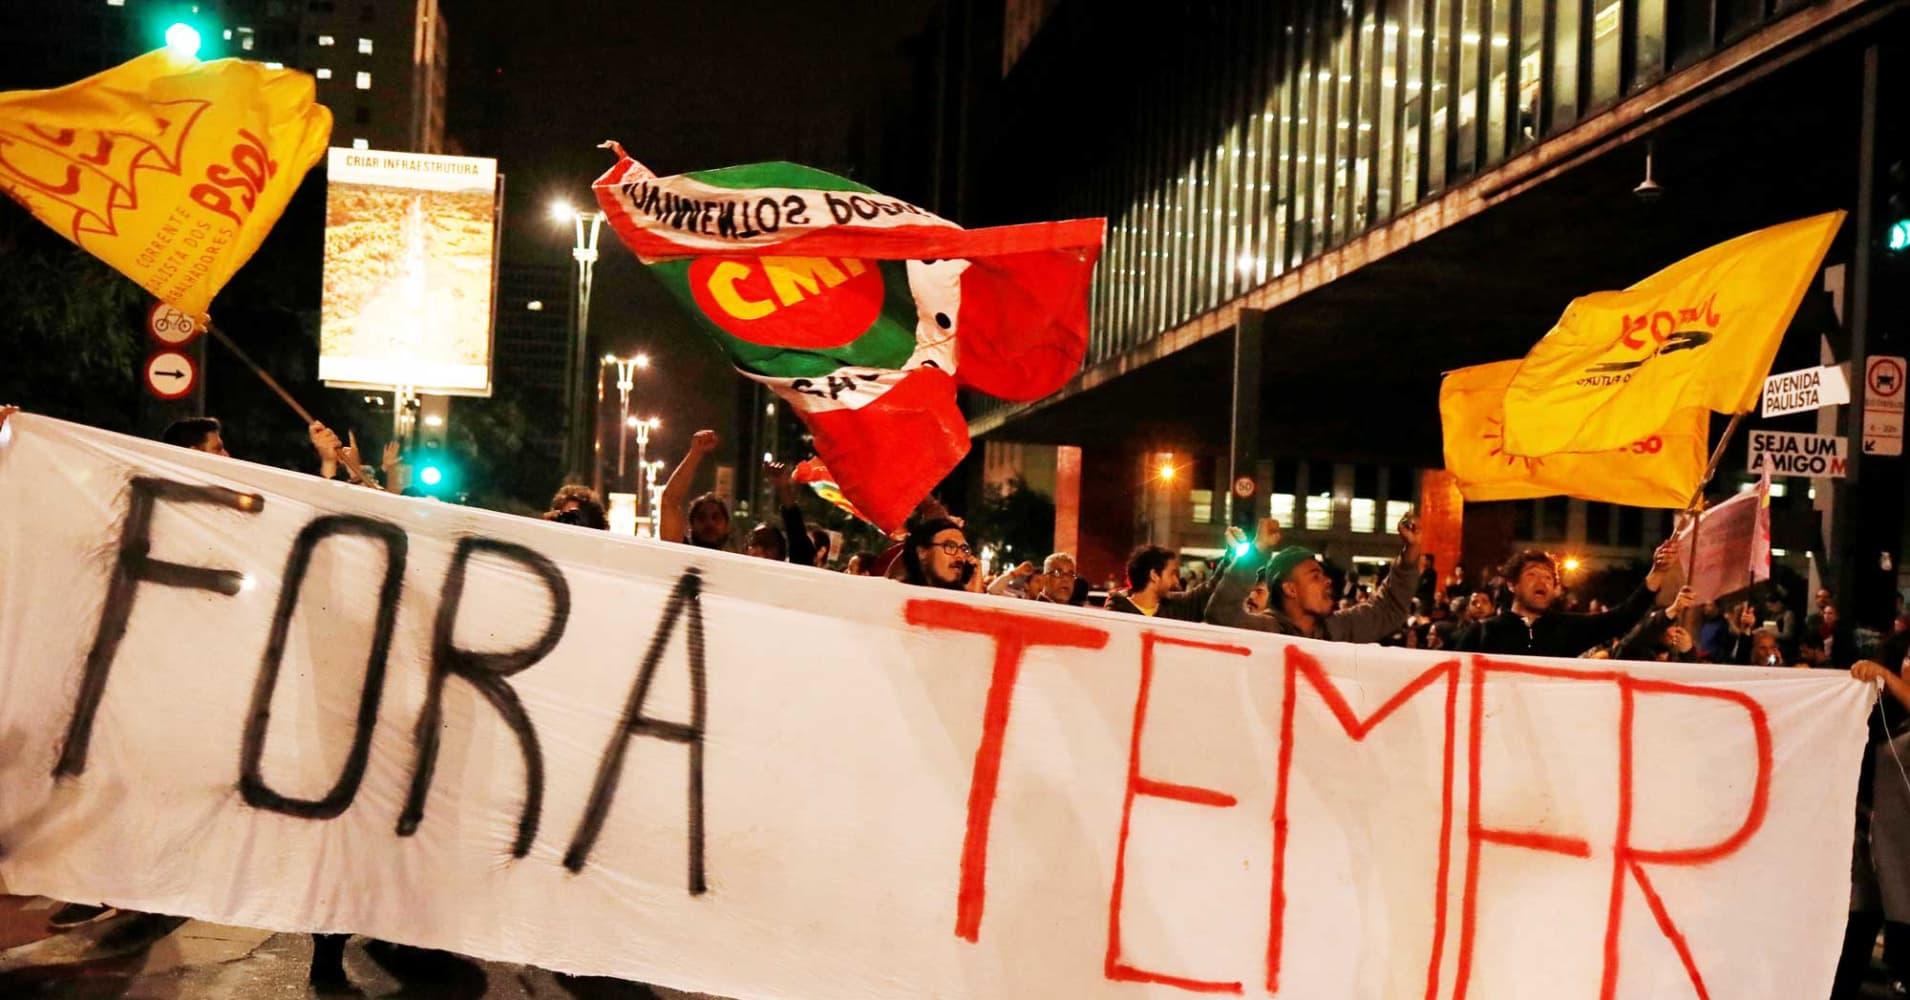 This Brazil stocks ETF is crashing more than 13% on an emerging political scandal